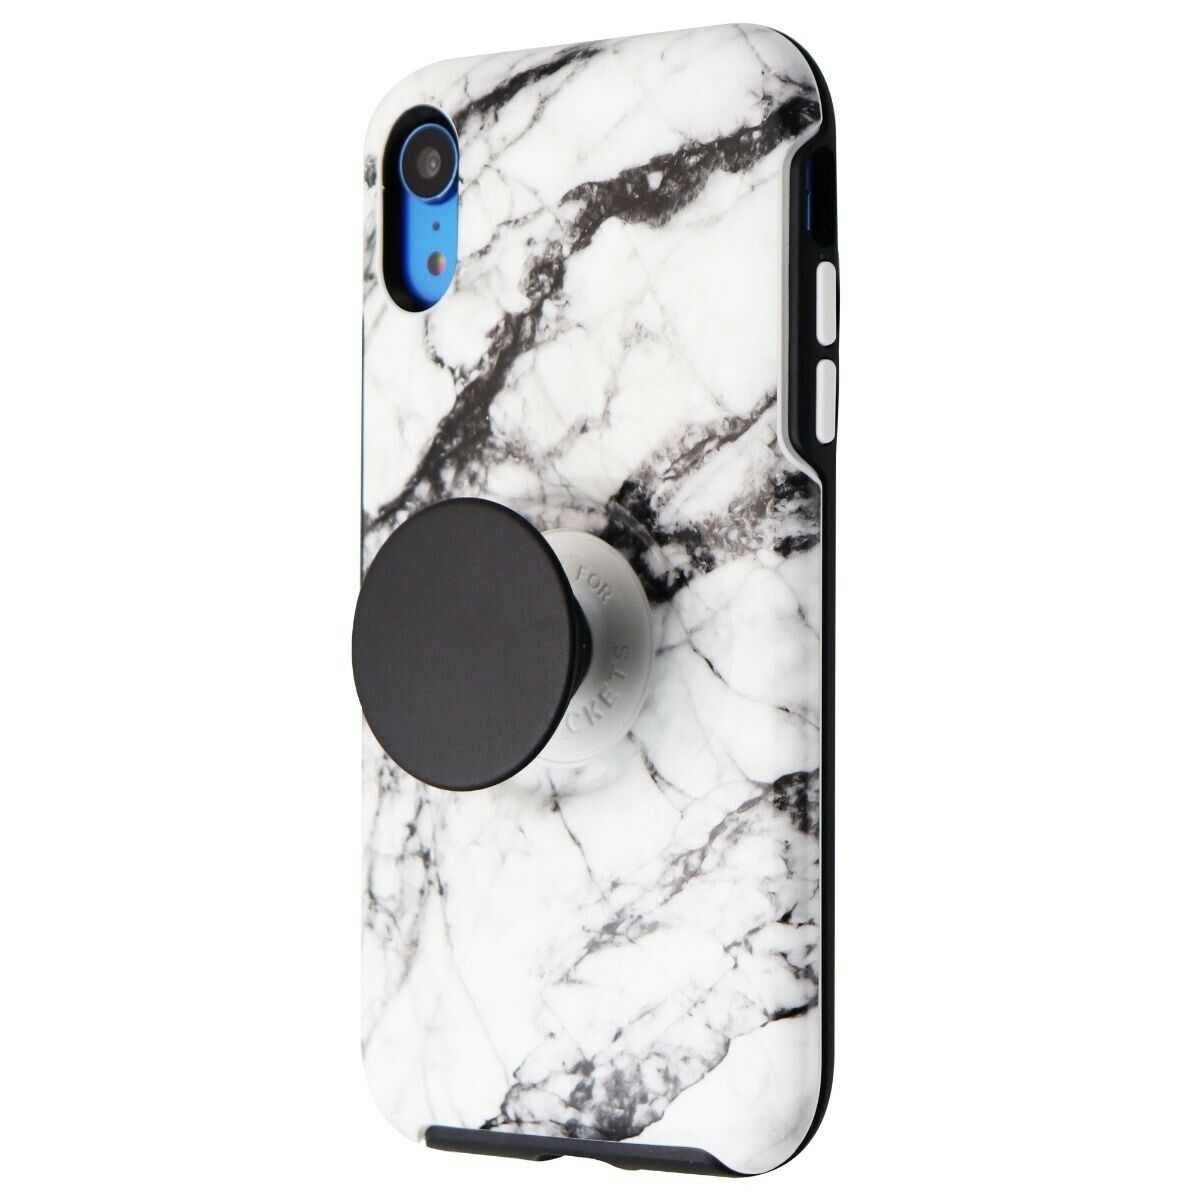 Details about otterbox pop symmetry series phone case